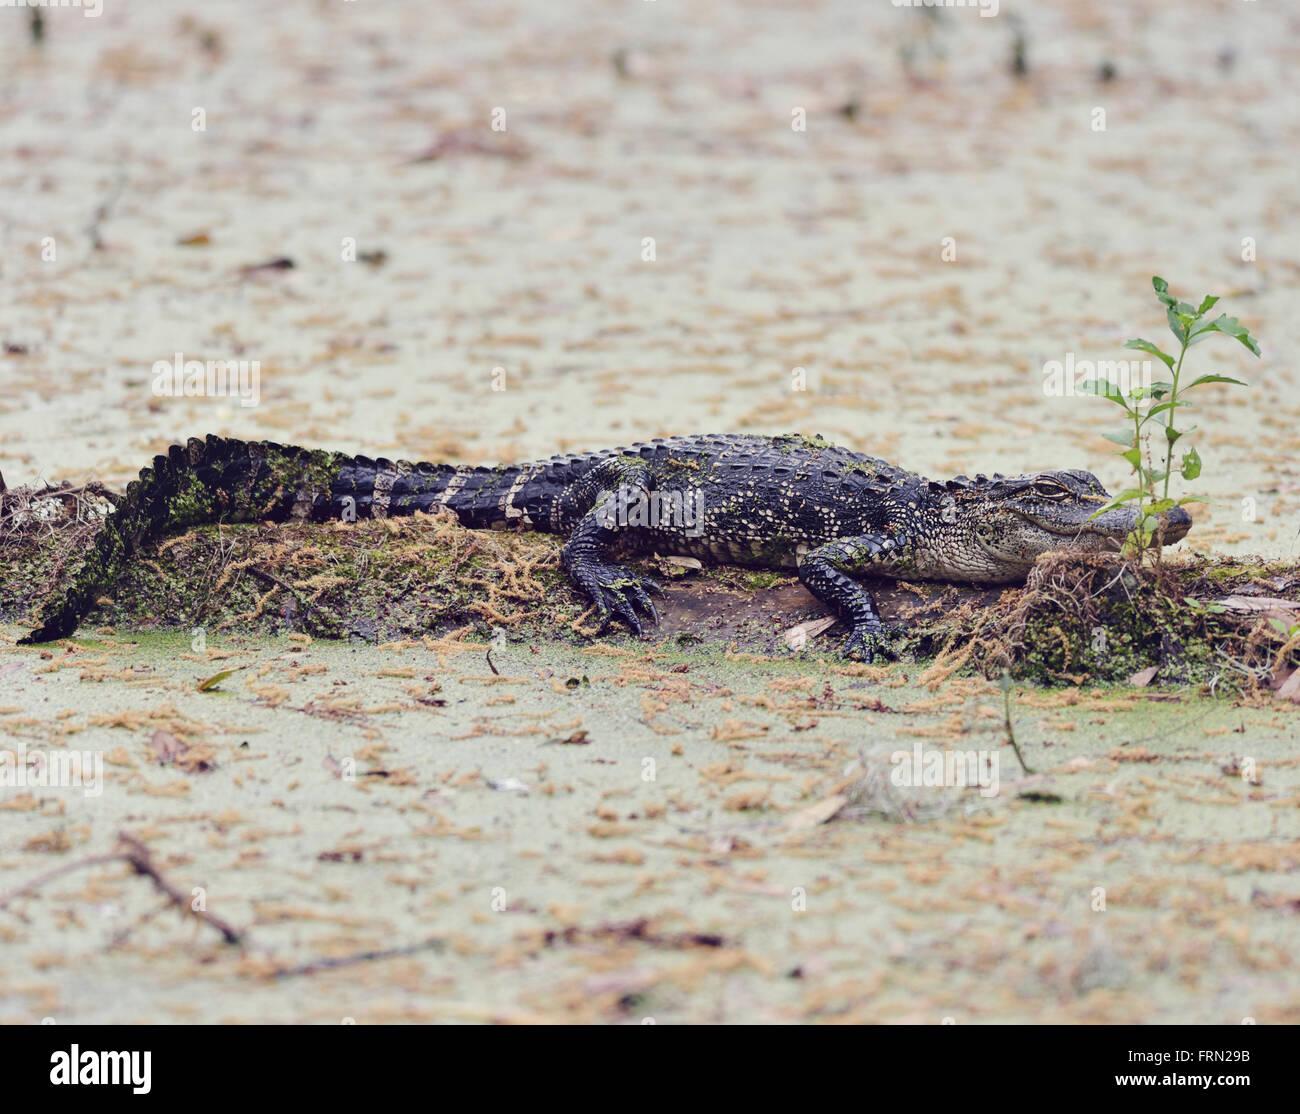 Young Florida Alligator on a Log - Stock Image